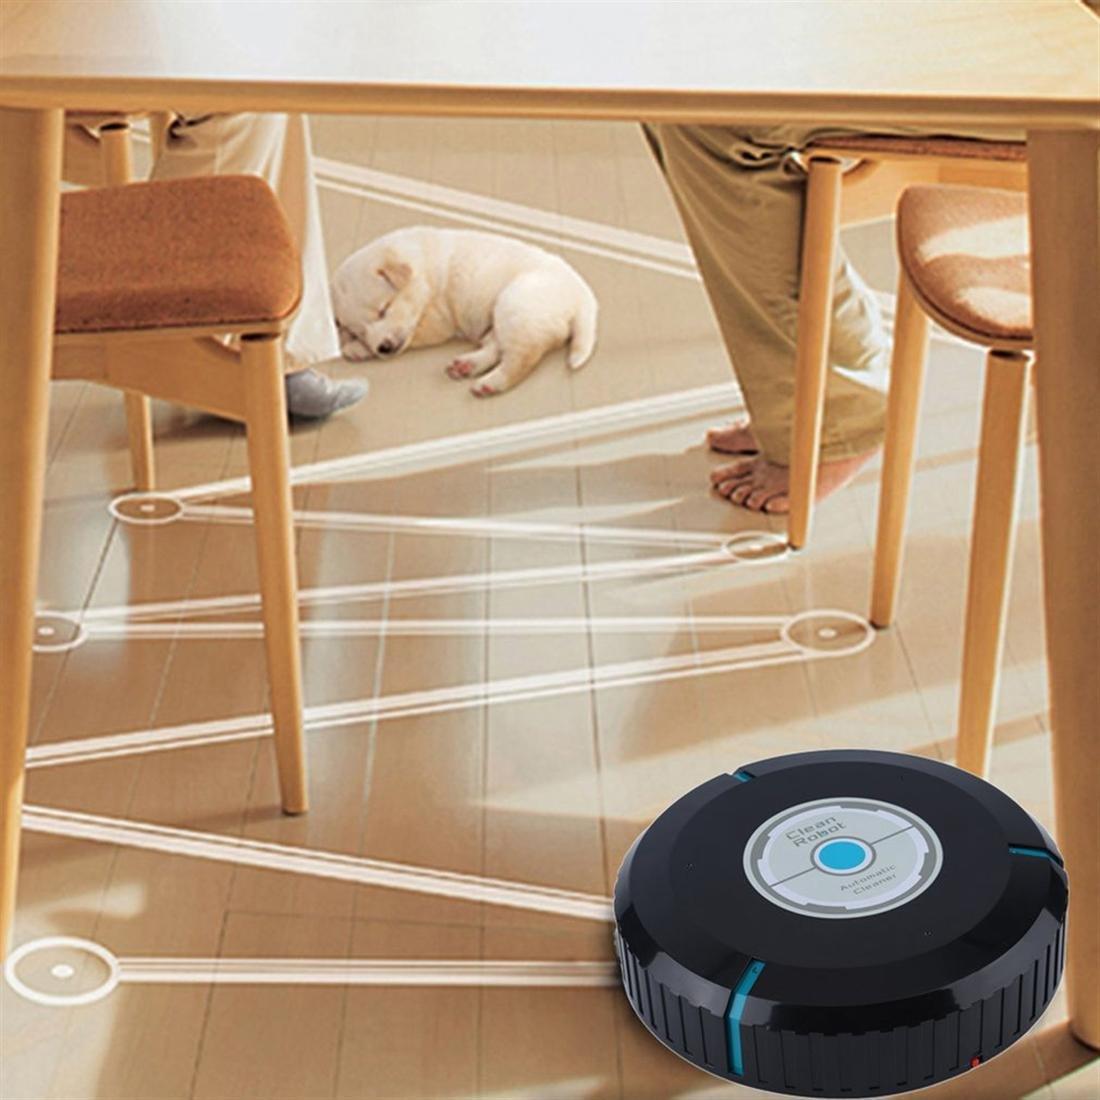 Start Pop High Efficient Home Automatic Vacuum Smart Floor Cleaning Robot Sweeper Mop